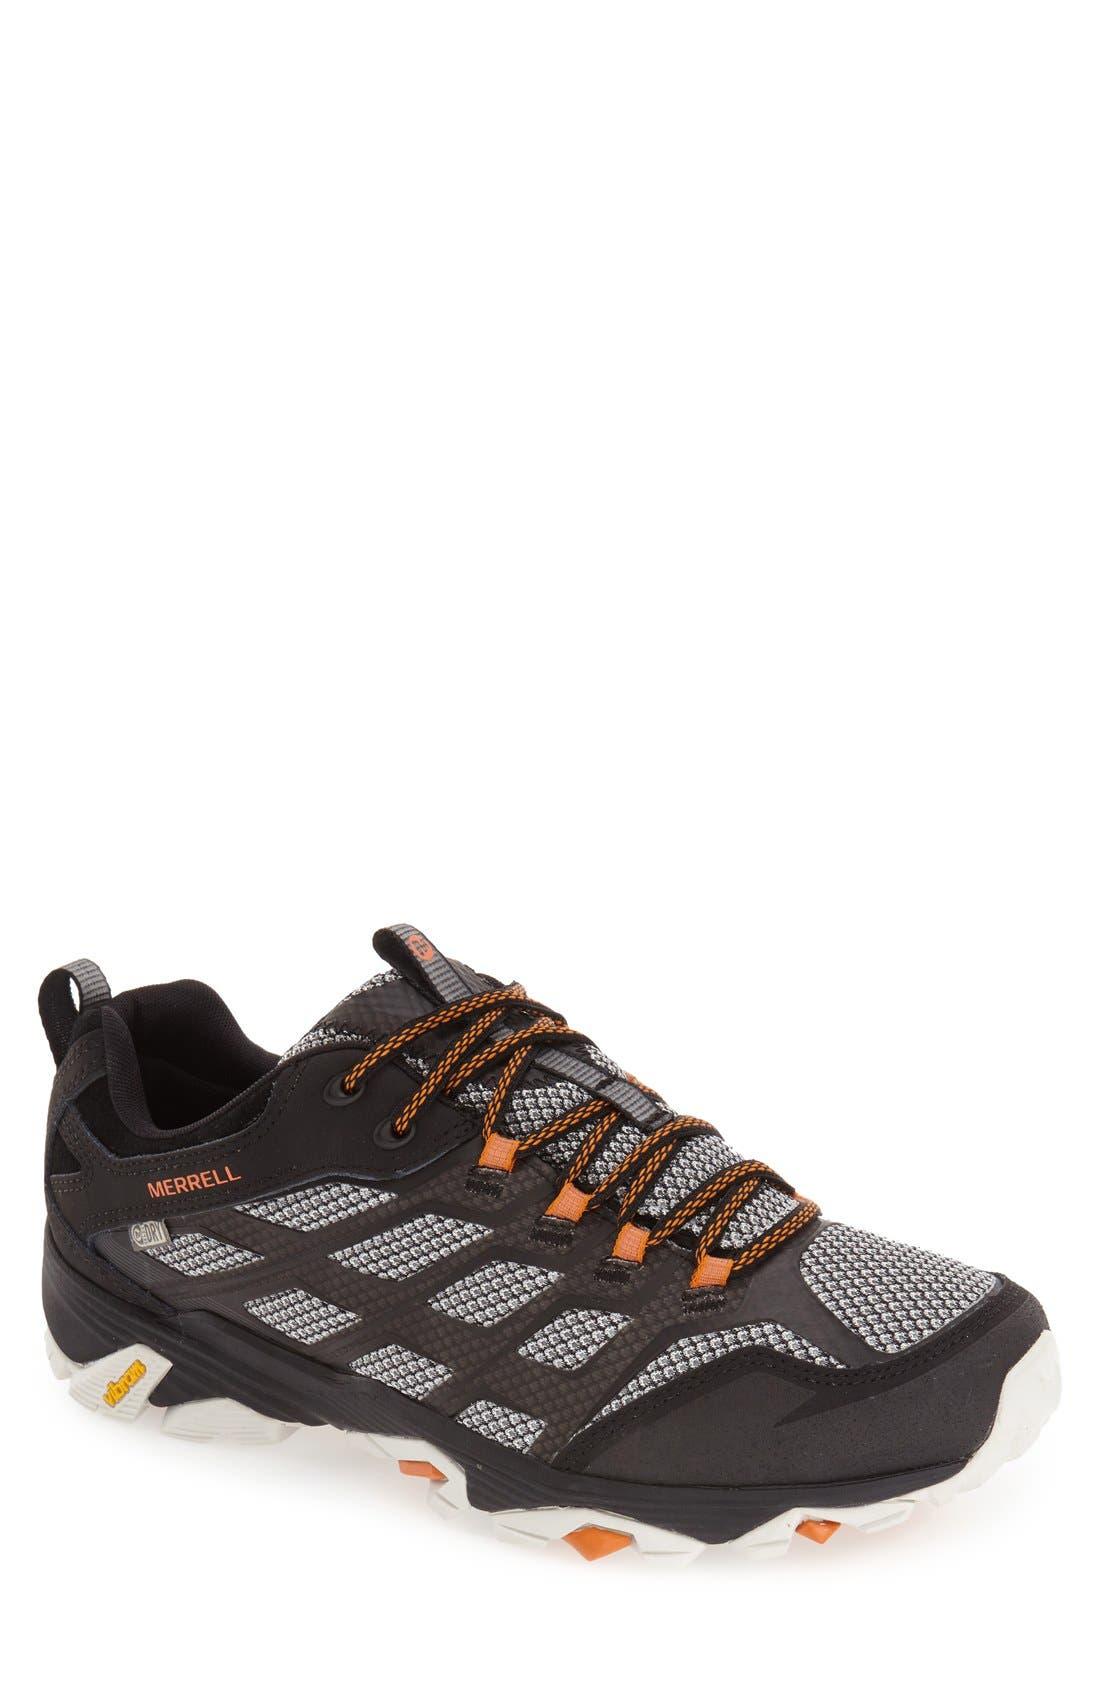 Moab FST Waterproof Hiking Shoe,                         Main,                         color, 001